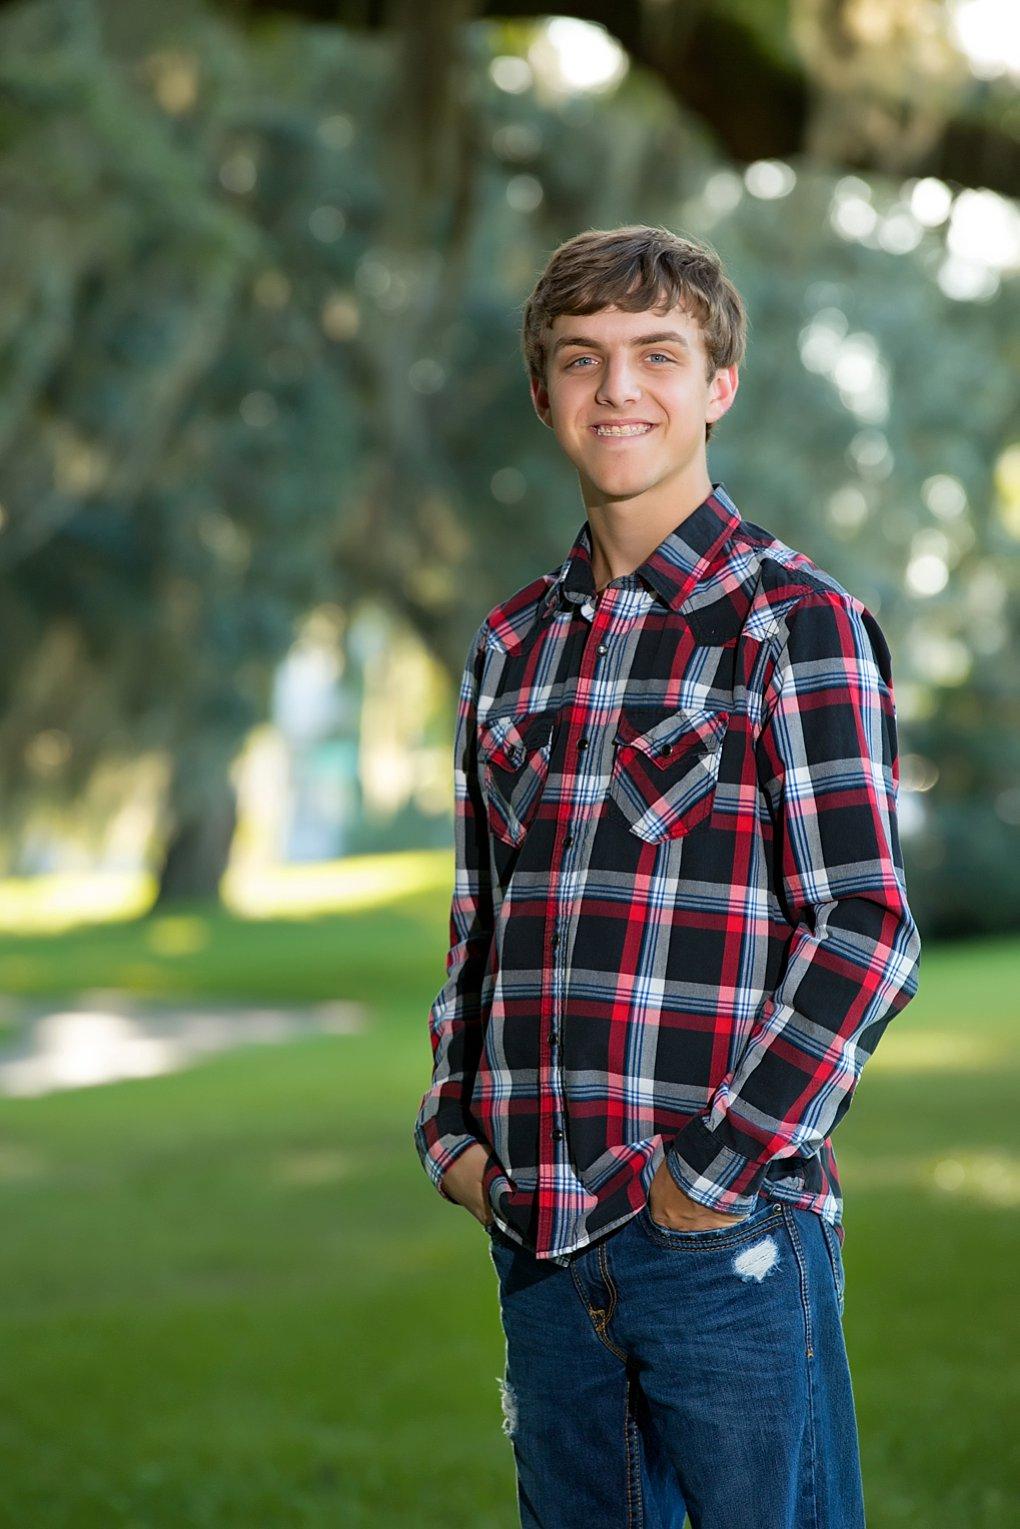 Justin-3.jpg